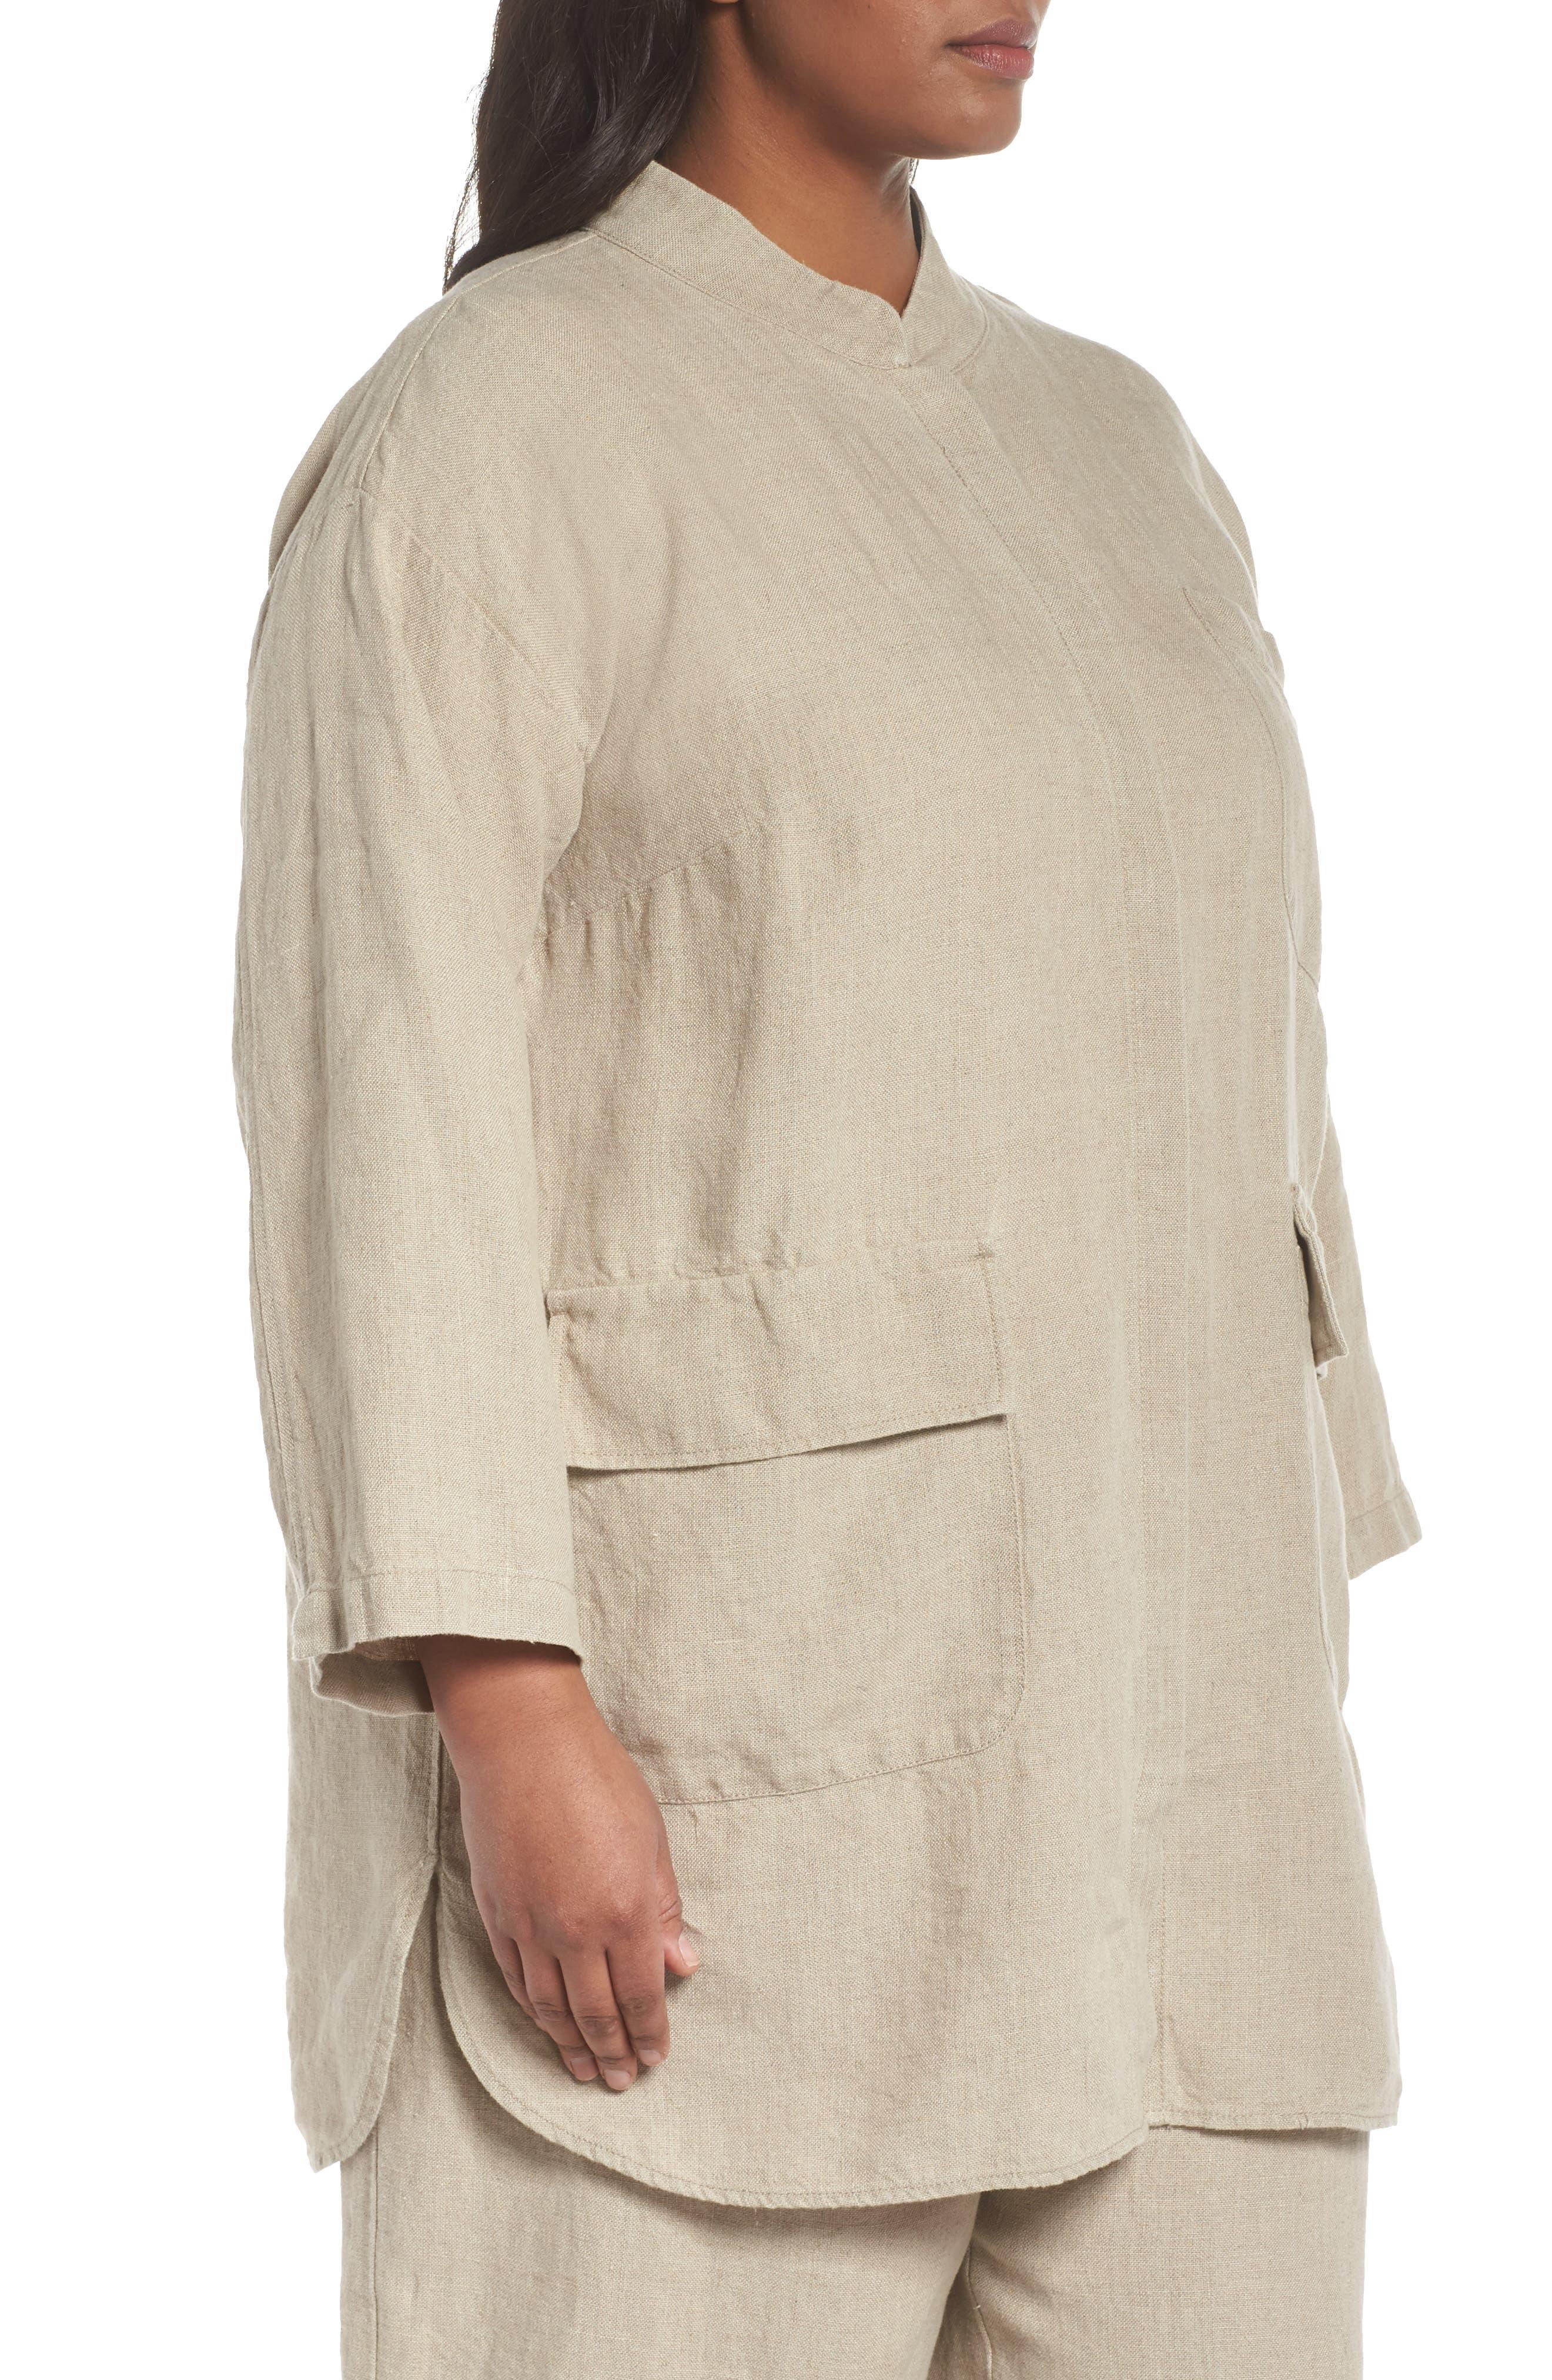 Organic Linen Jacket,                             Alternate thumbnail 3, color,                             251